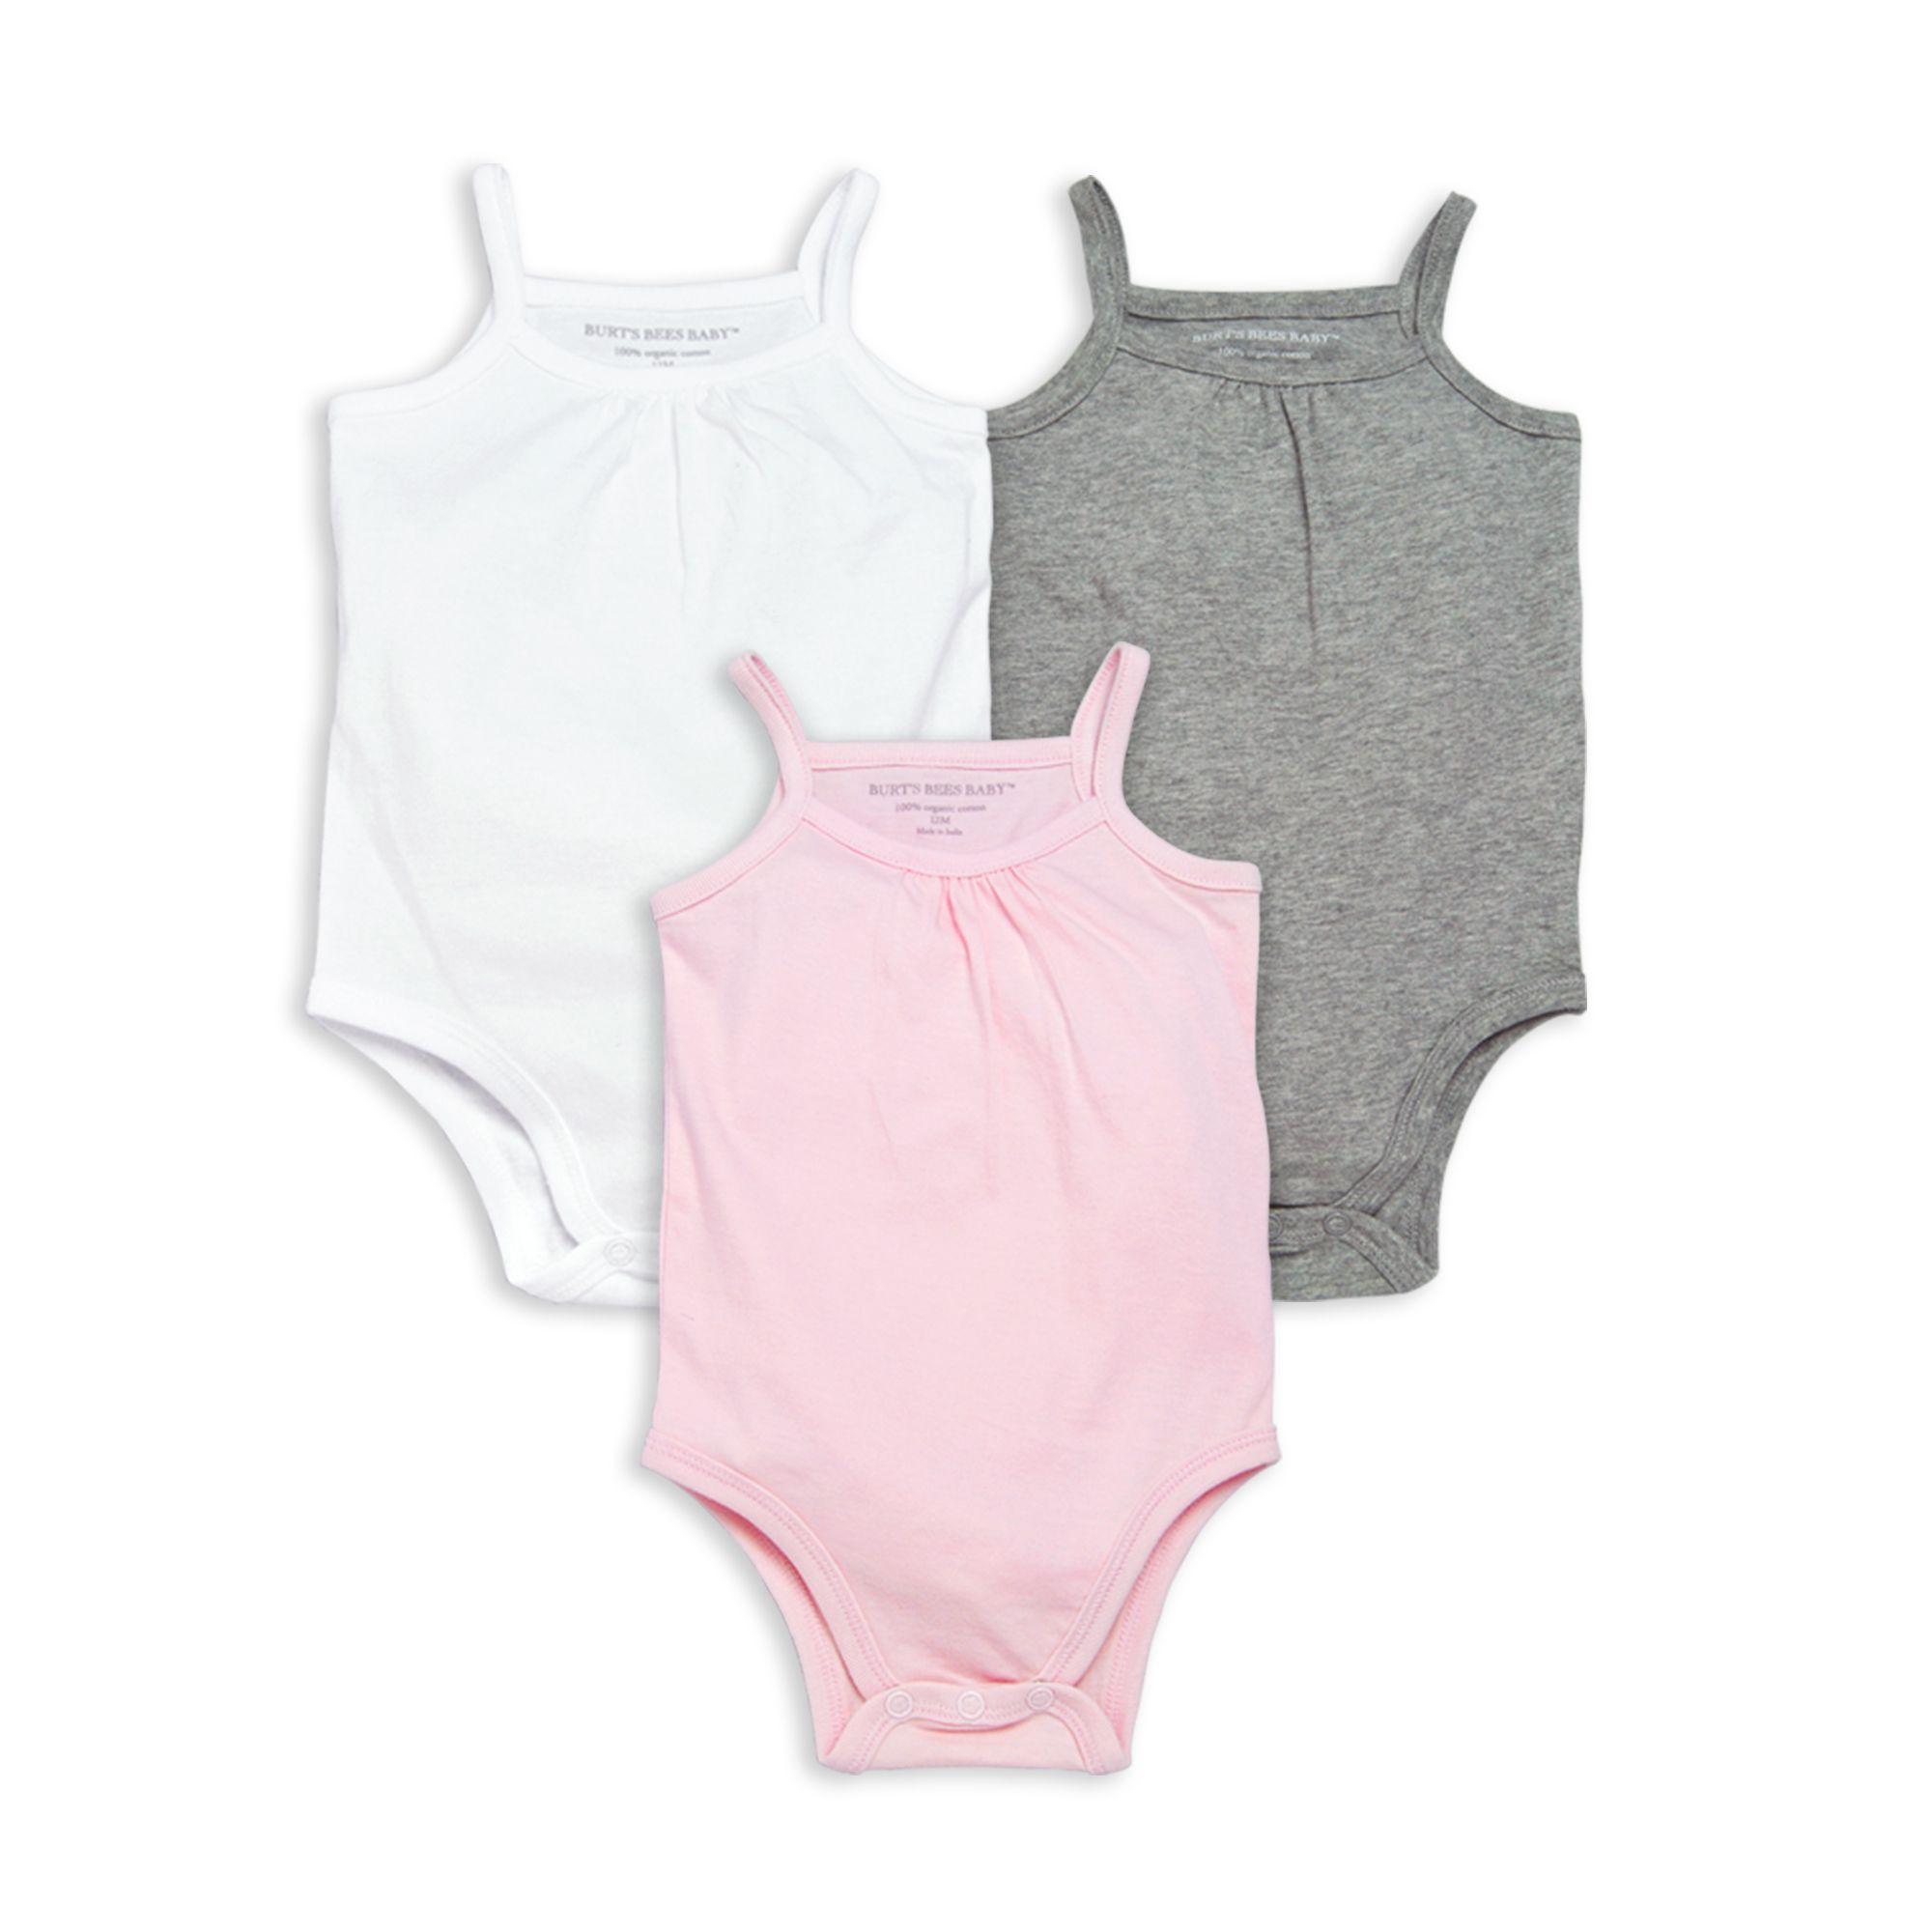 Classic Organic Baby Bodysuit 3 Pack In 2020 Organic Baby Bodysuit Burts Bees Baby Baby Bodysuit